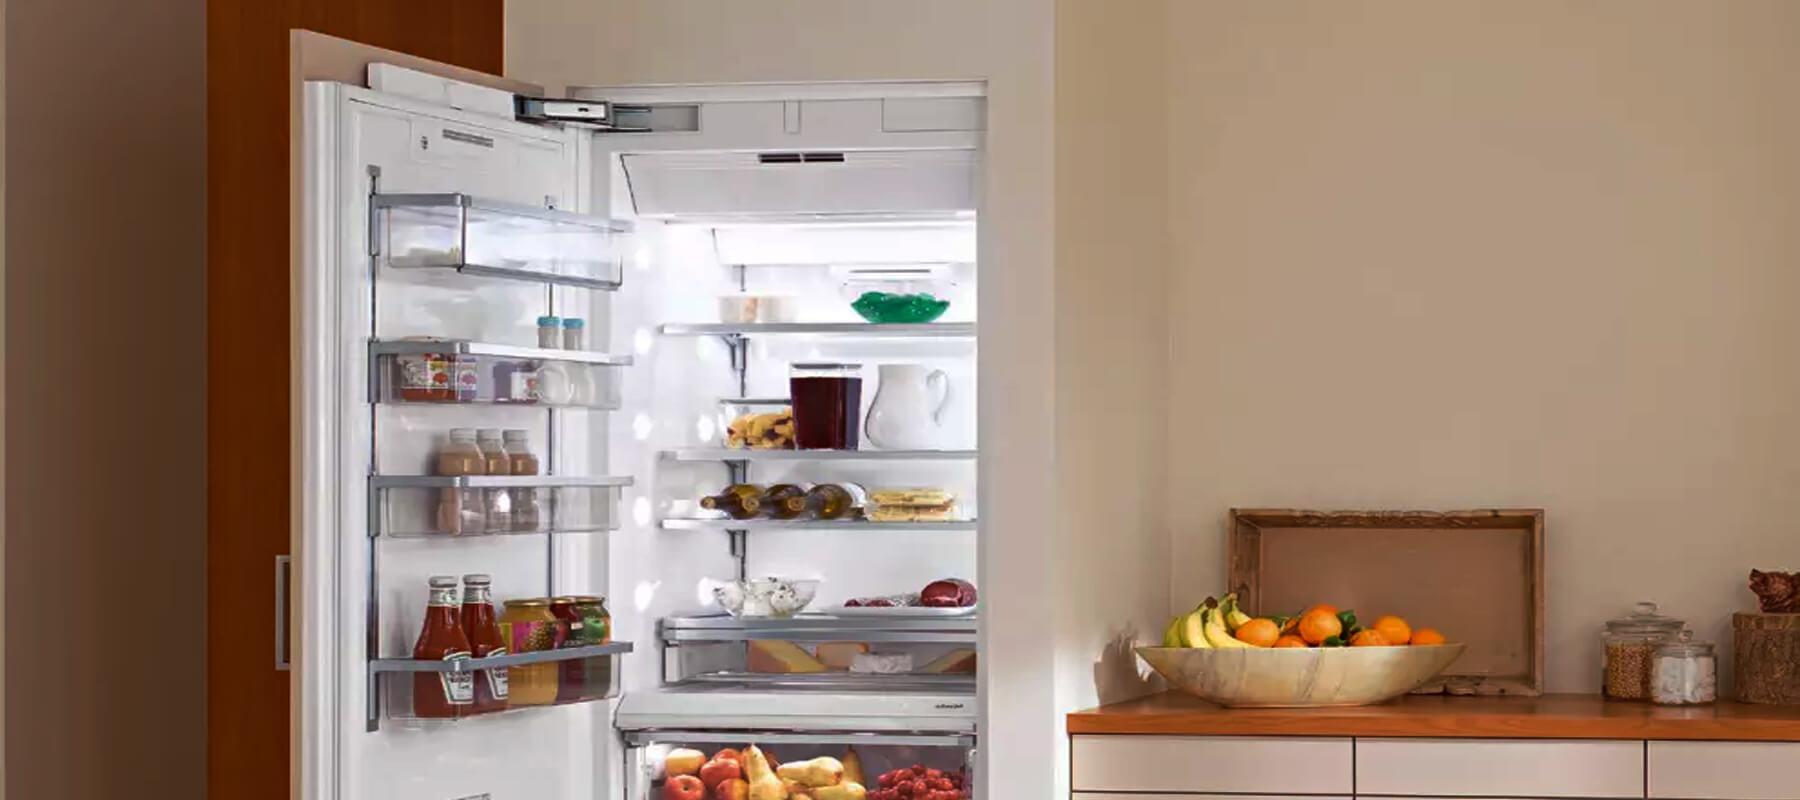 Miele Built in Refrigerator Repair Service | Built-in Refrigerator Repair